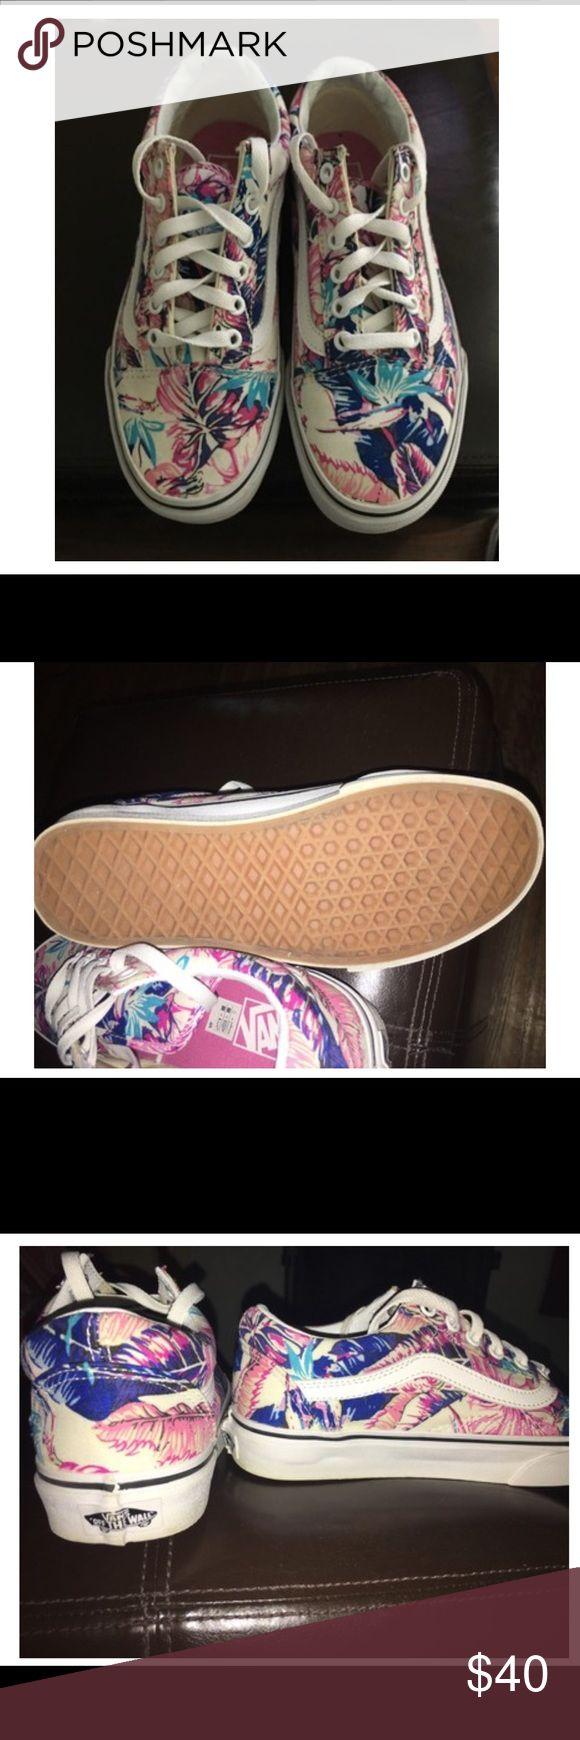 Vans Sneakers!  Low Top New conditions. Low top vans. Unique tropical floral pattern. Size is 6.5 women. Vans Shoes Sneakers